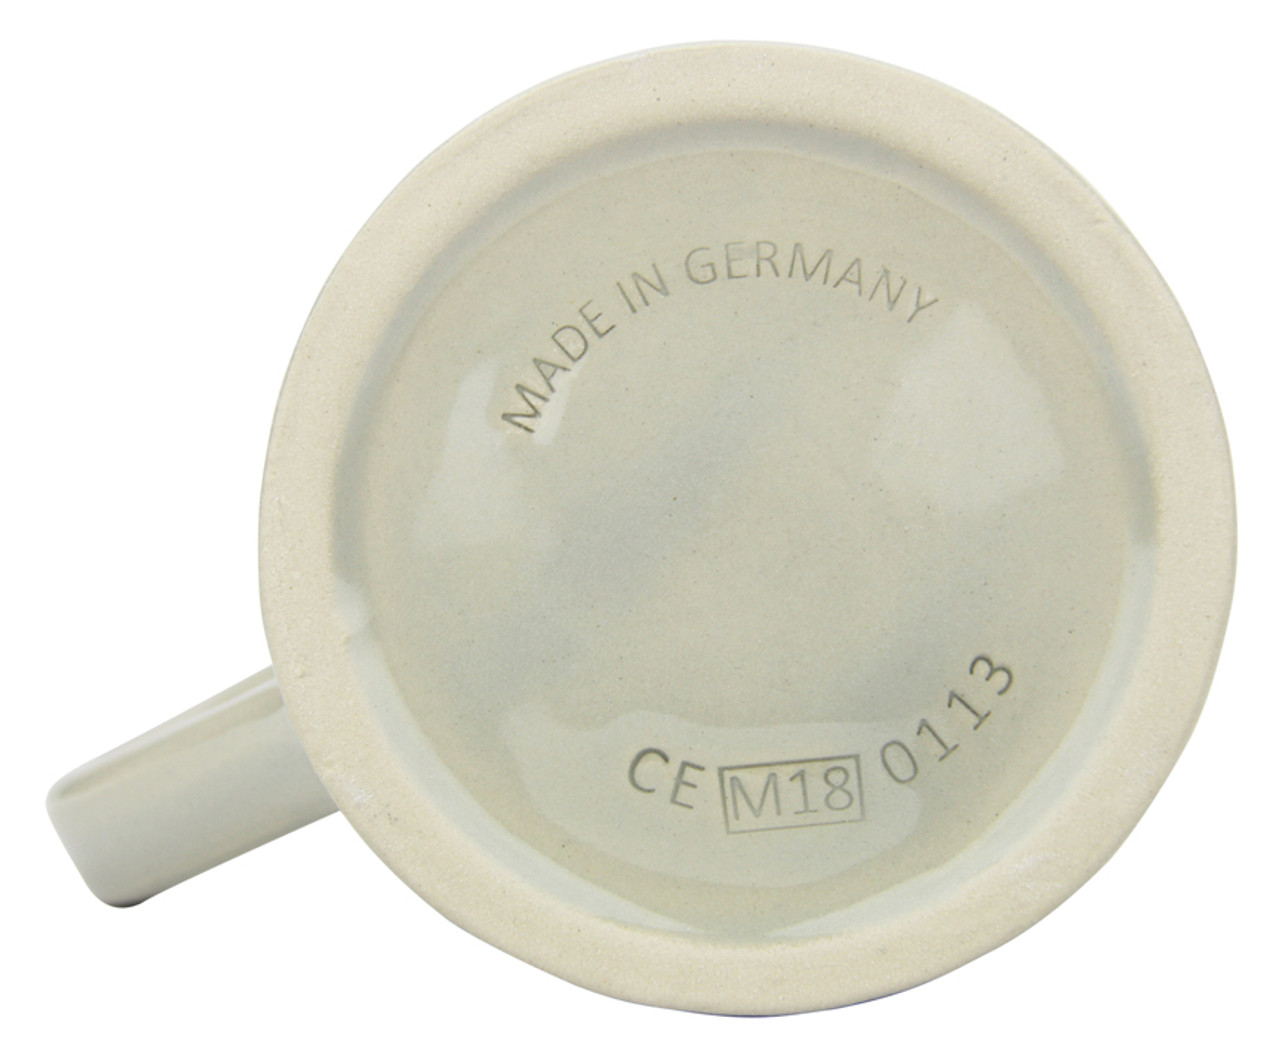 Bottom, .5 Liter Stoneware Beer Mug, Made in Germany